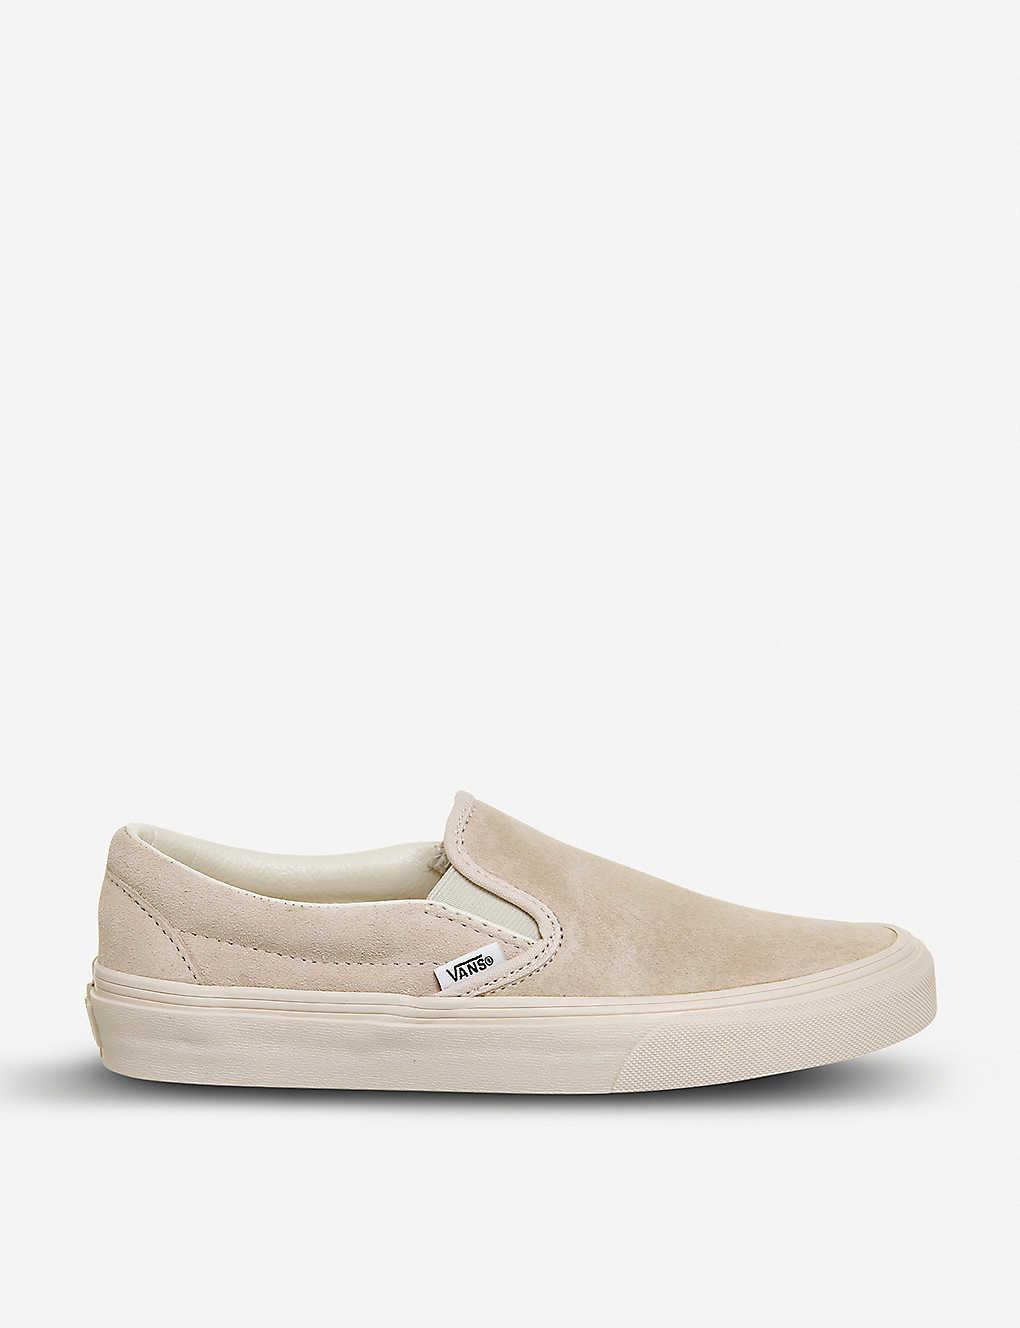 2ee5cd767f VANS - Classic slip-on suede skate shoes | Selfridges.com